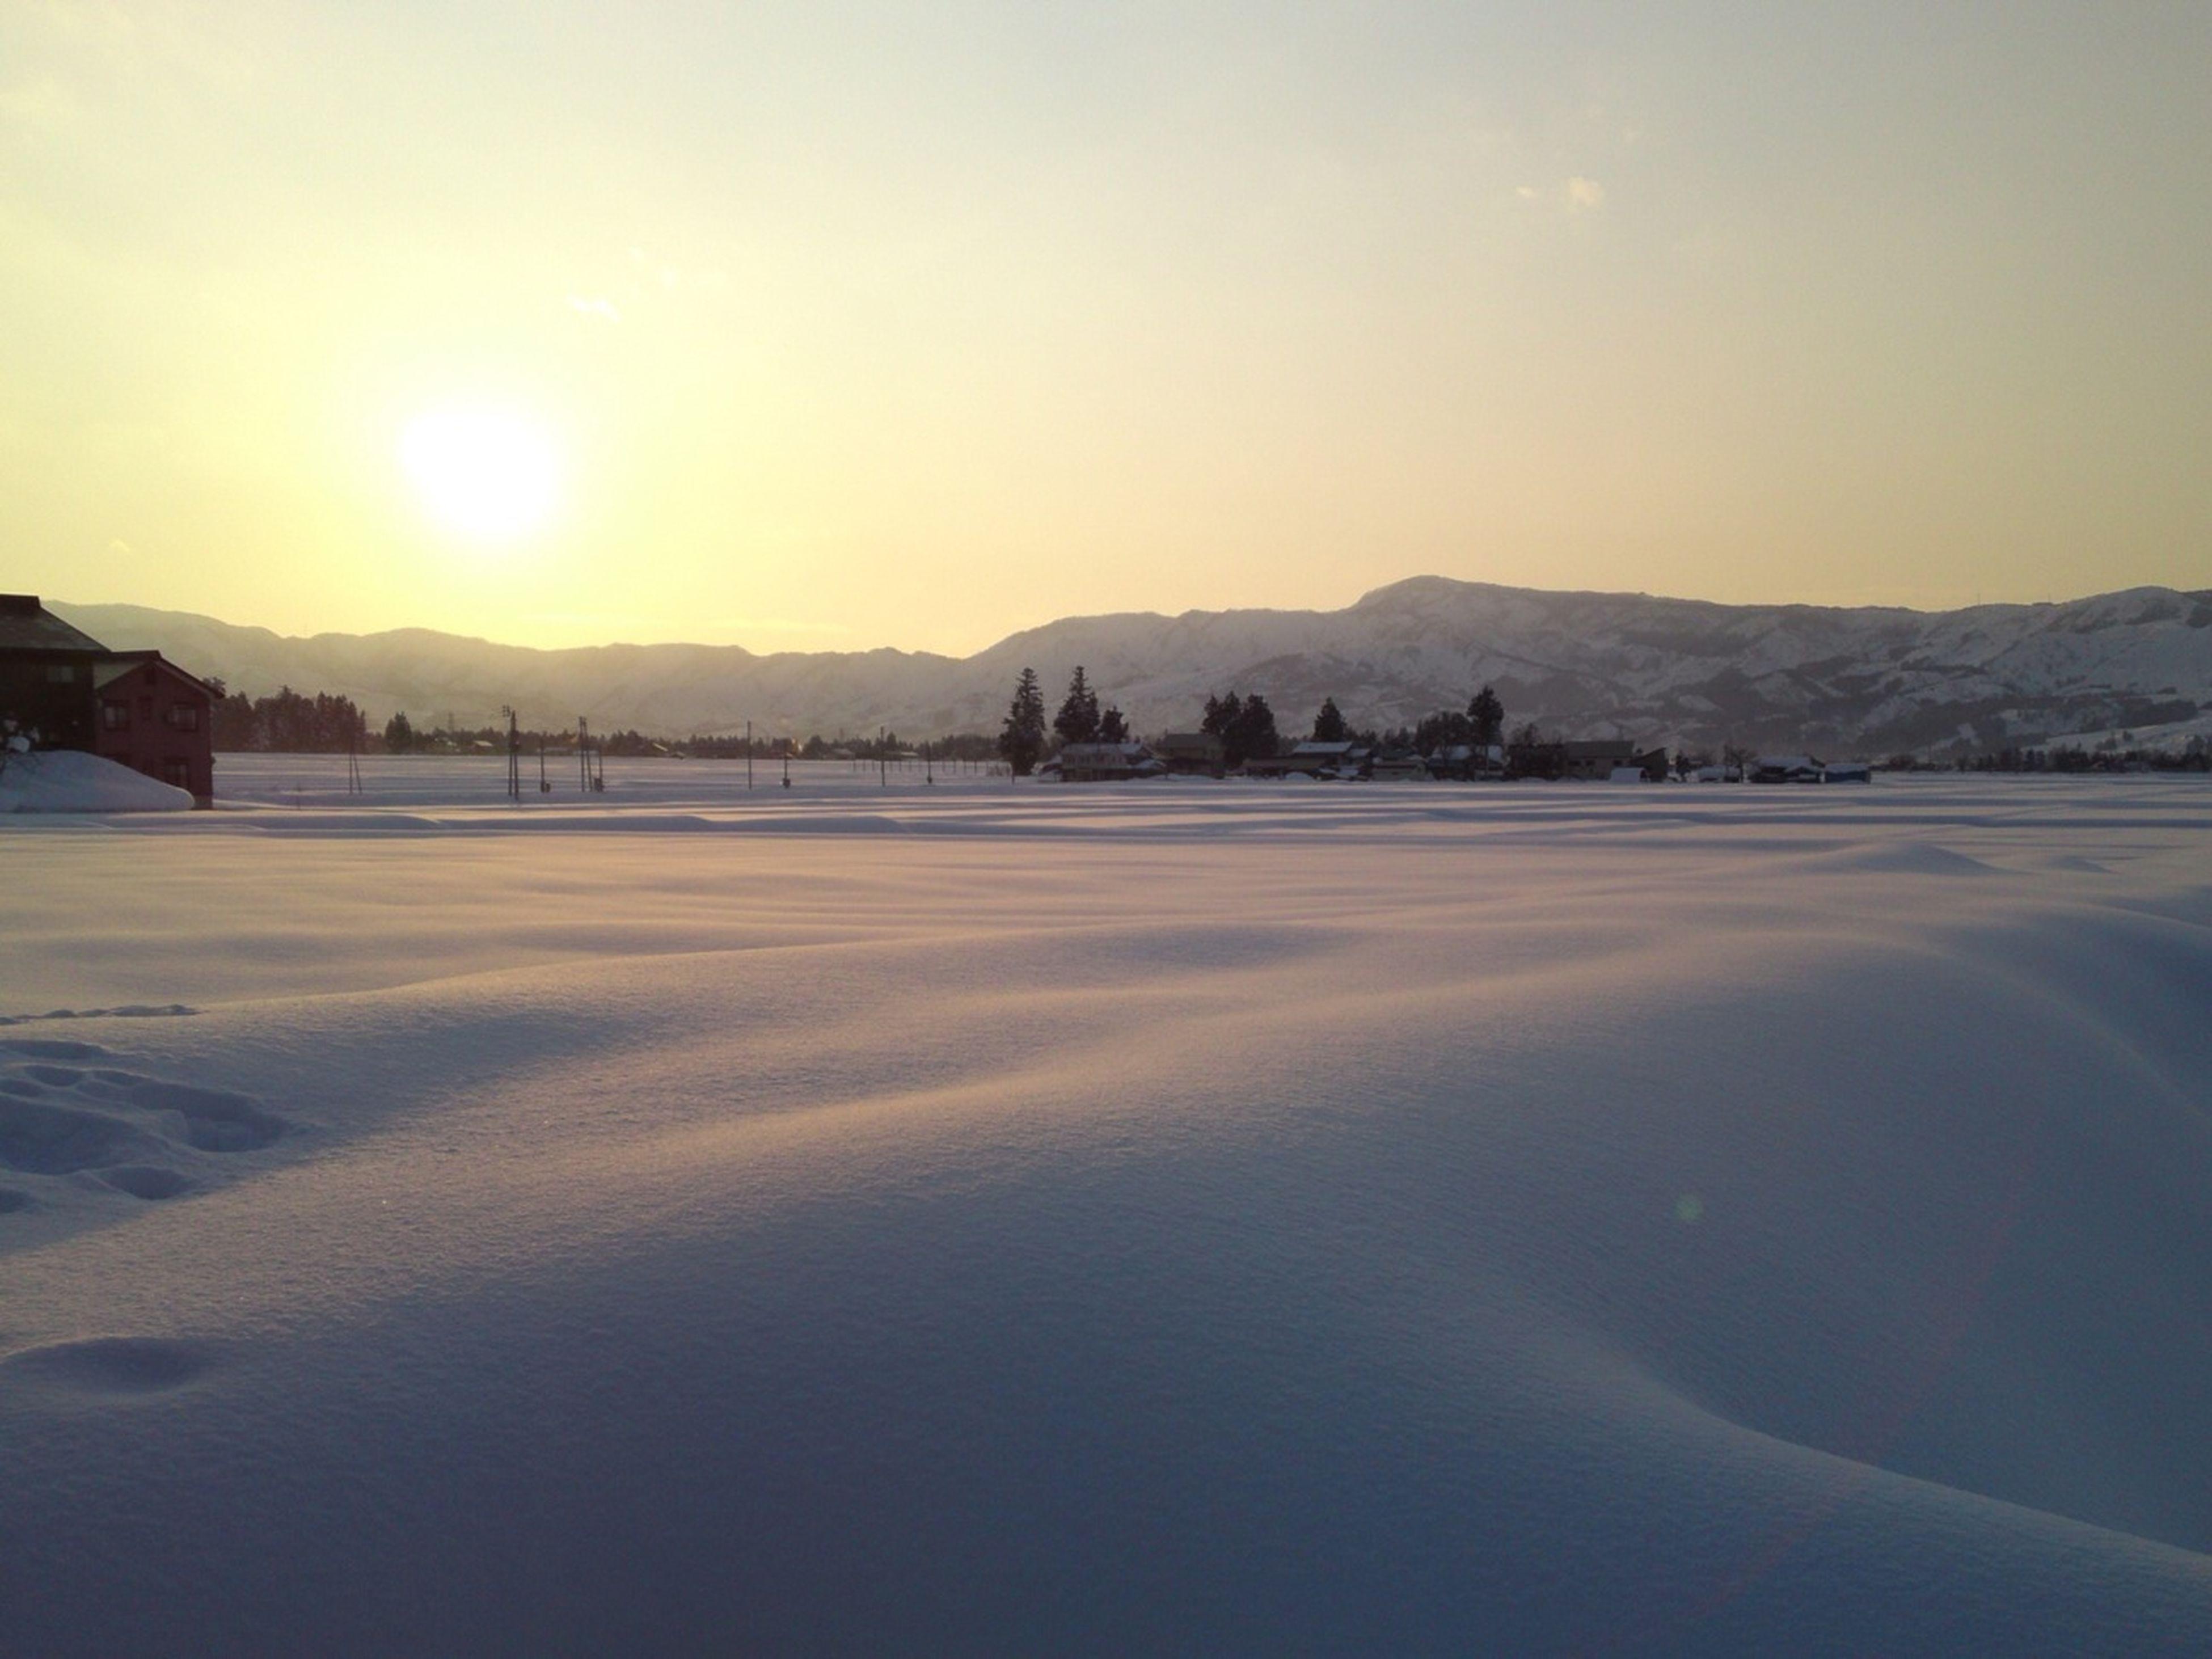 Snow Japan Countryside Nagano